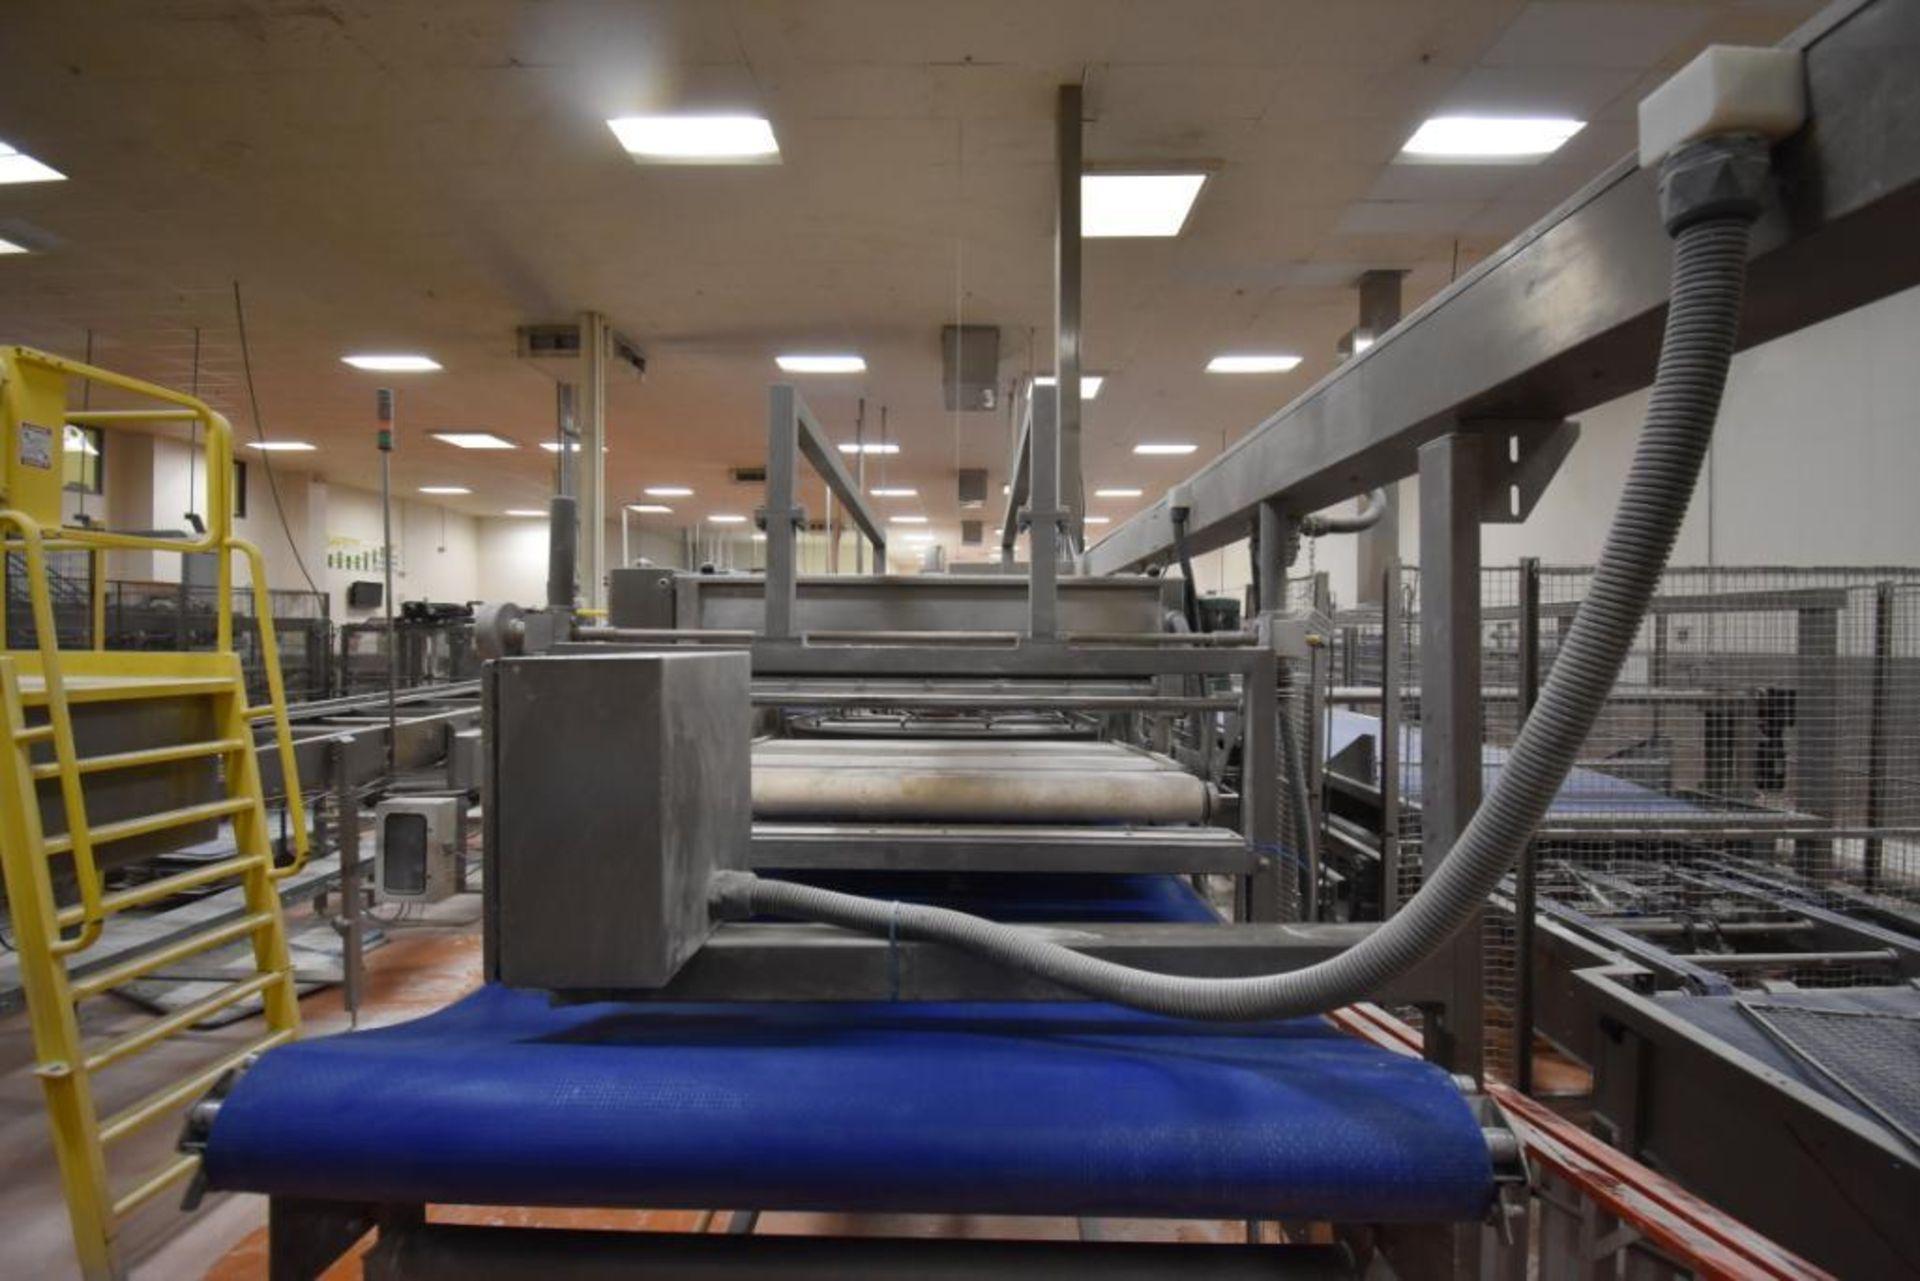 2007 Fritsch Laminator 3000 dough line - Image 204 of 280